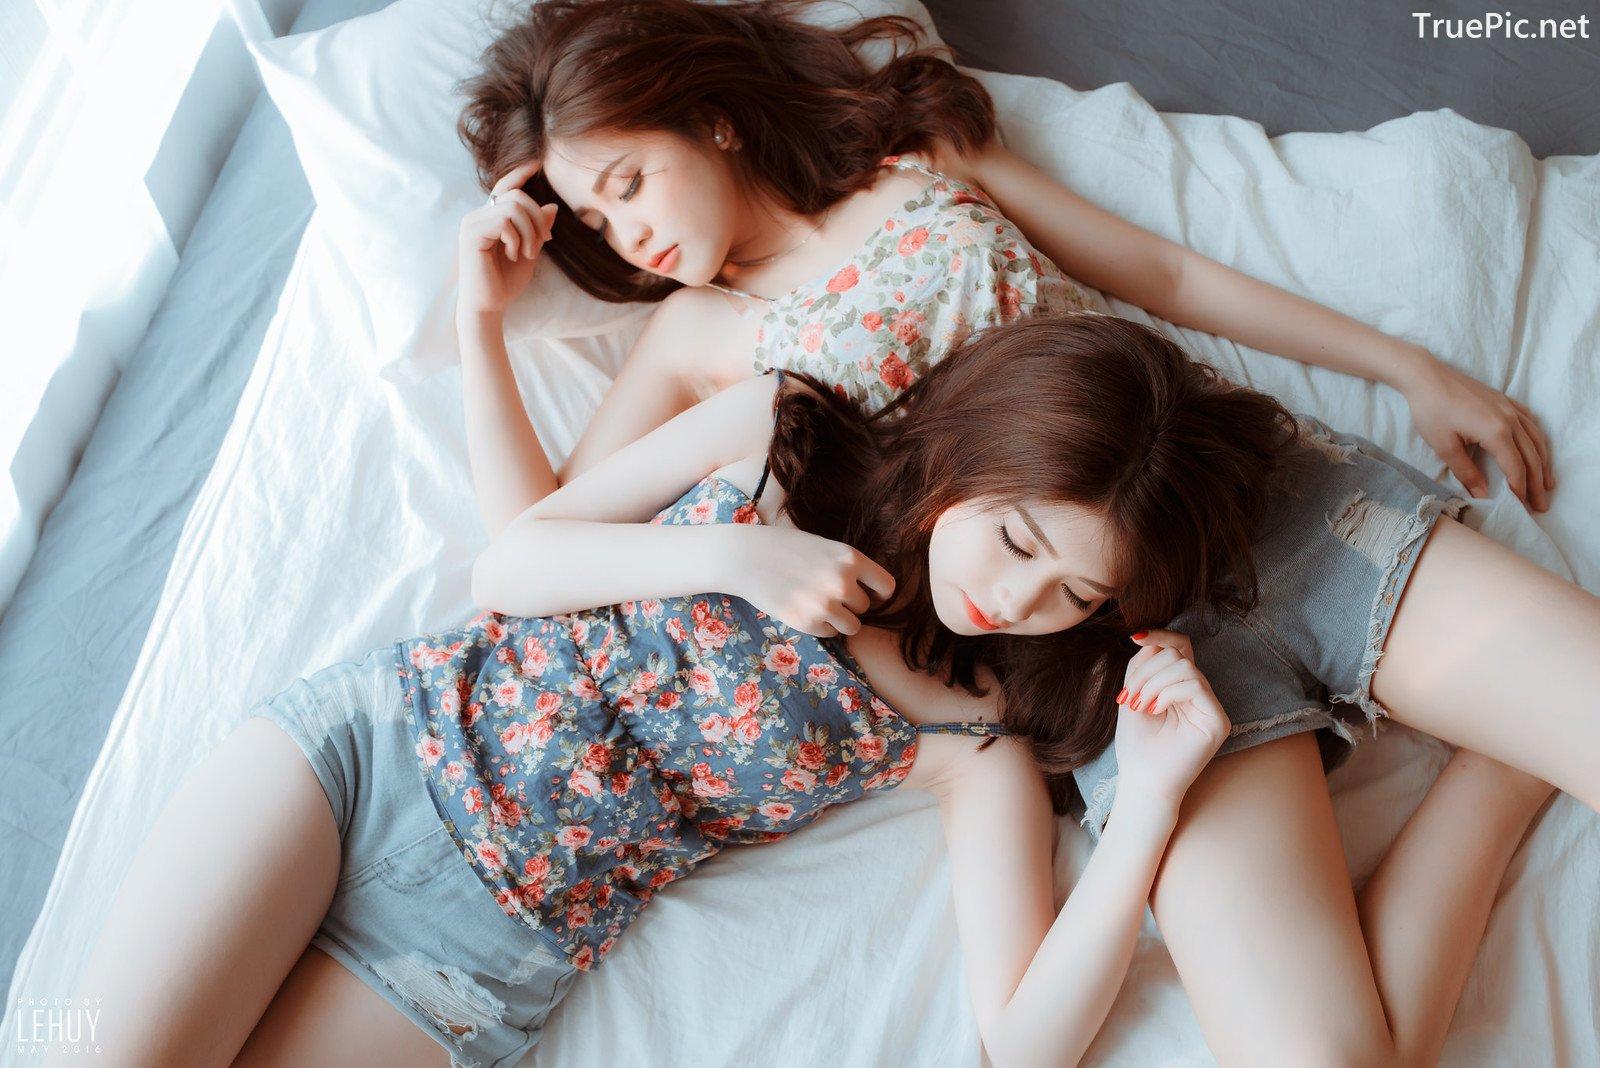 Image-Vietnamese-Hot-Girl-Photo-Beautiful-Twin-Sister-TruePic.net- Picture-10